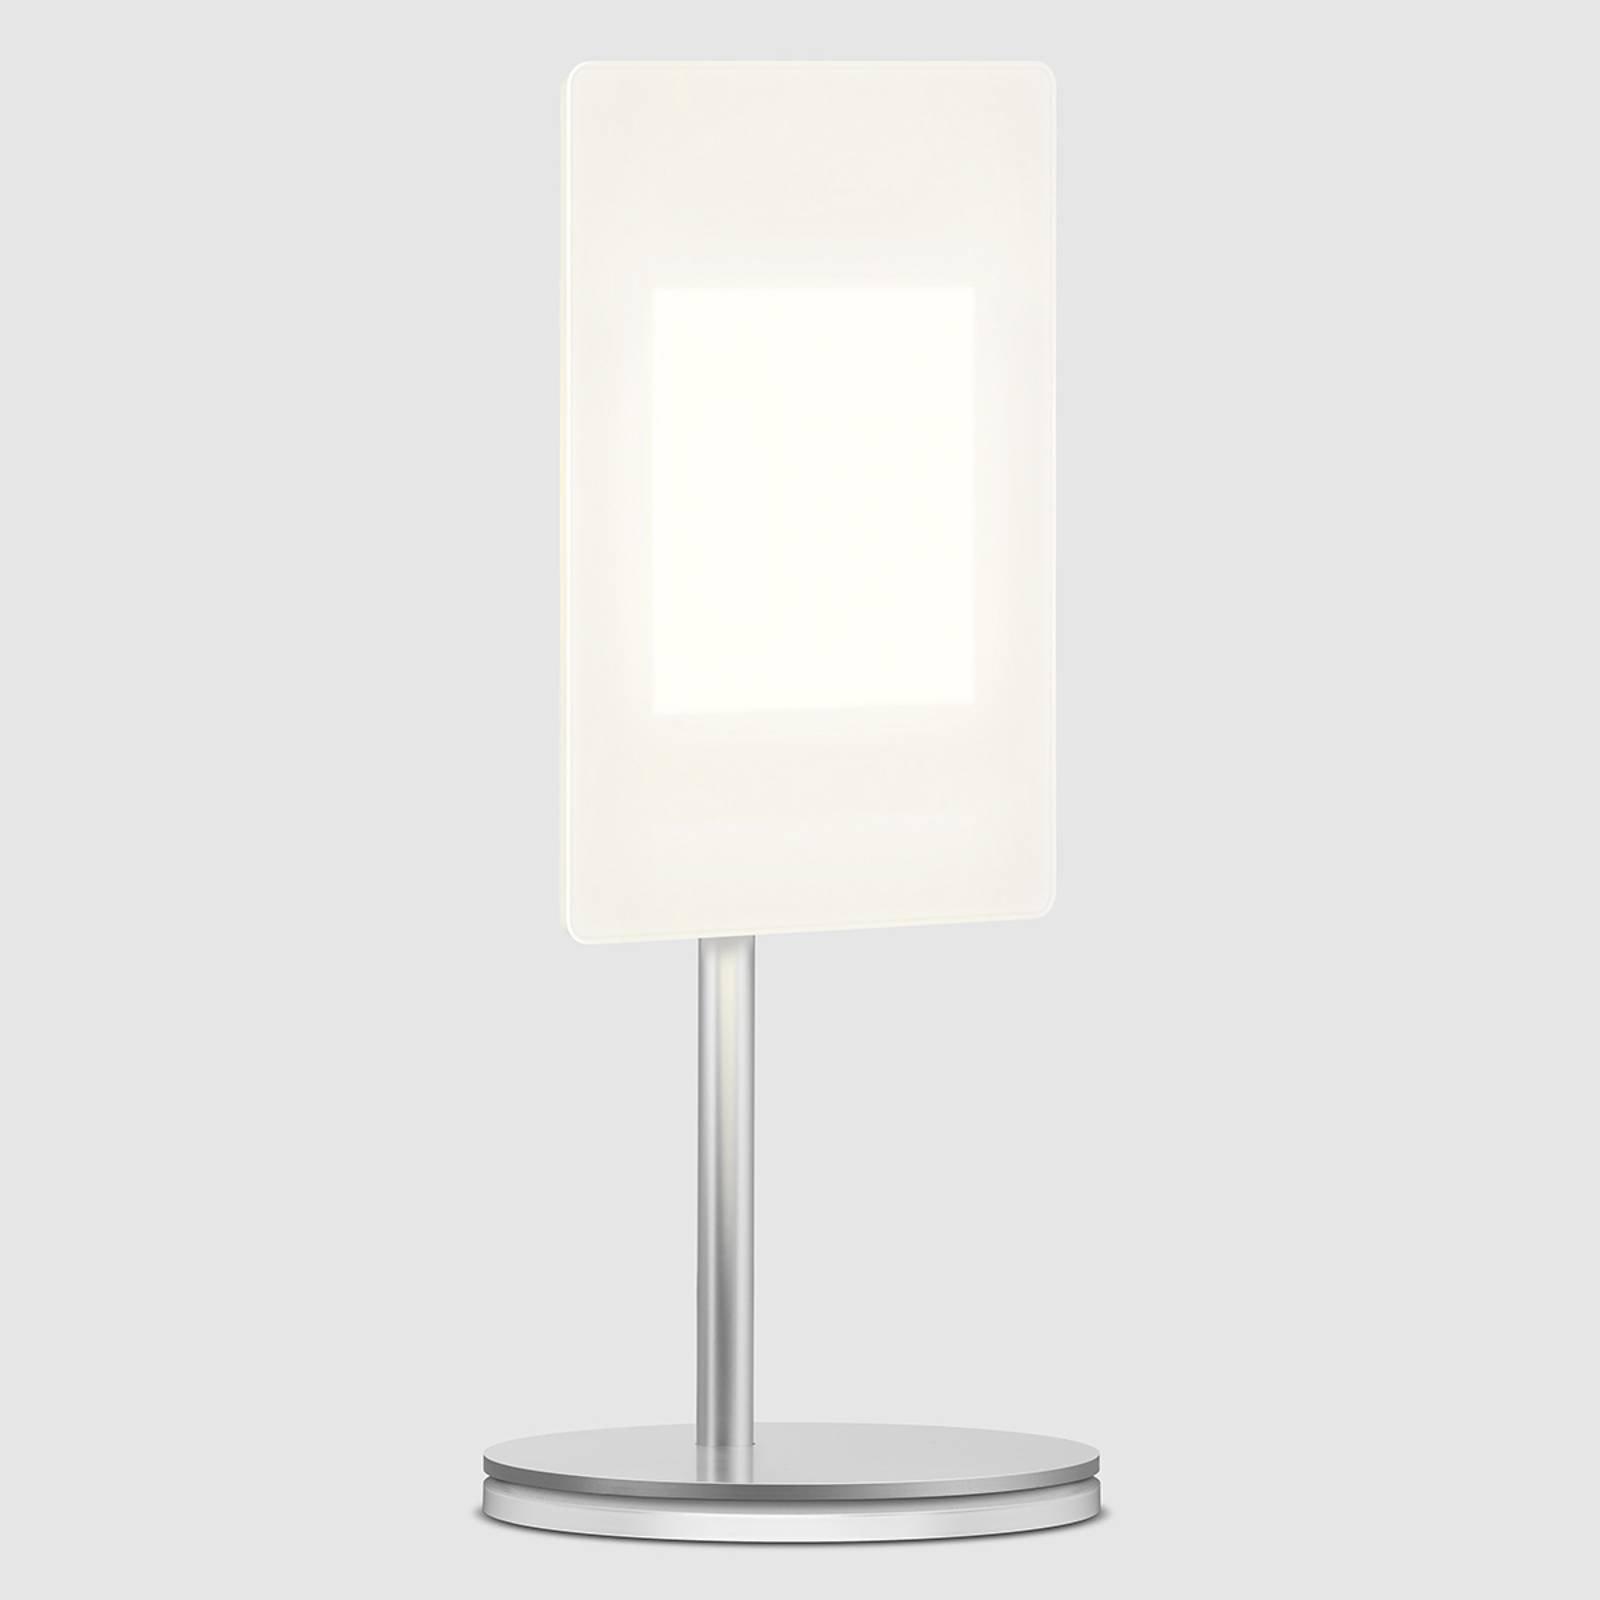 OLED-bordlampe OMLED One t1 med OLED, hvit